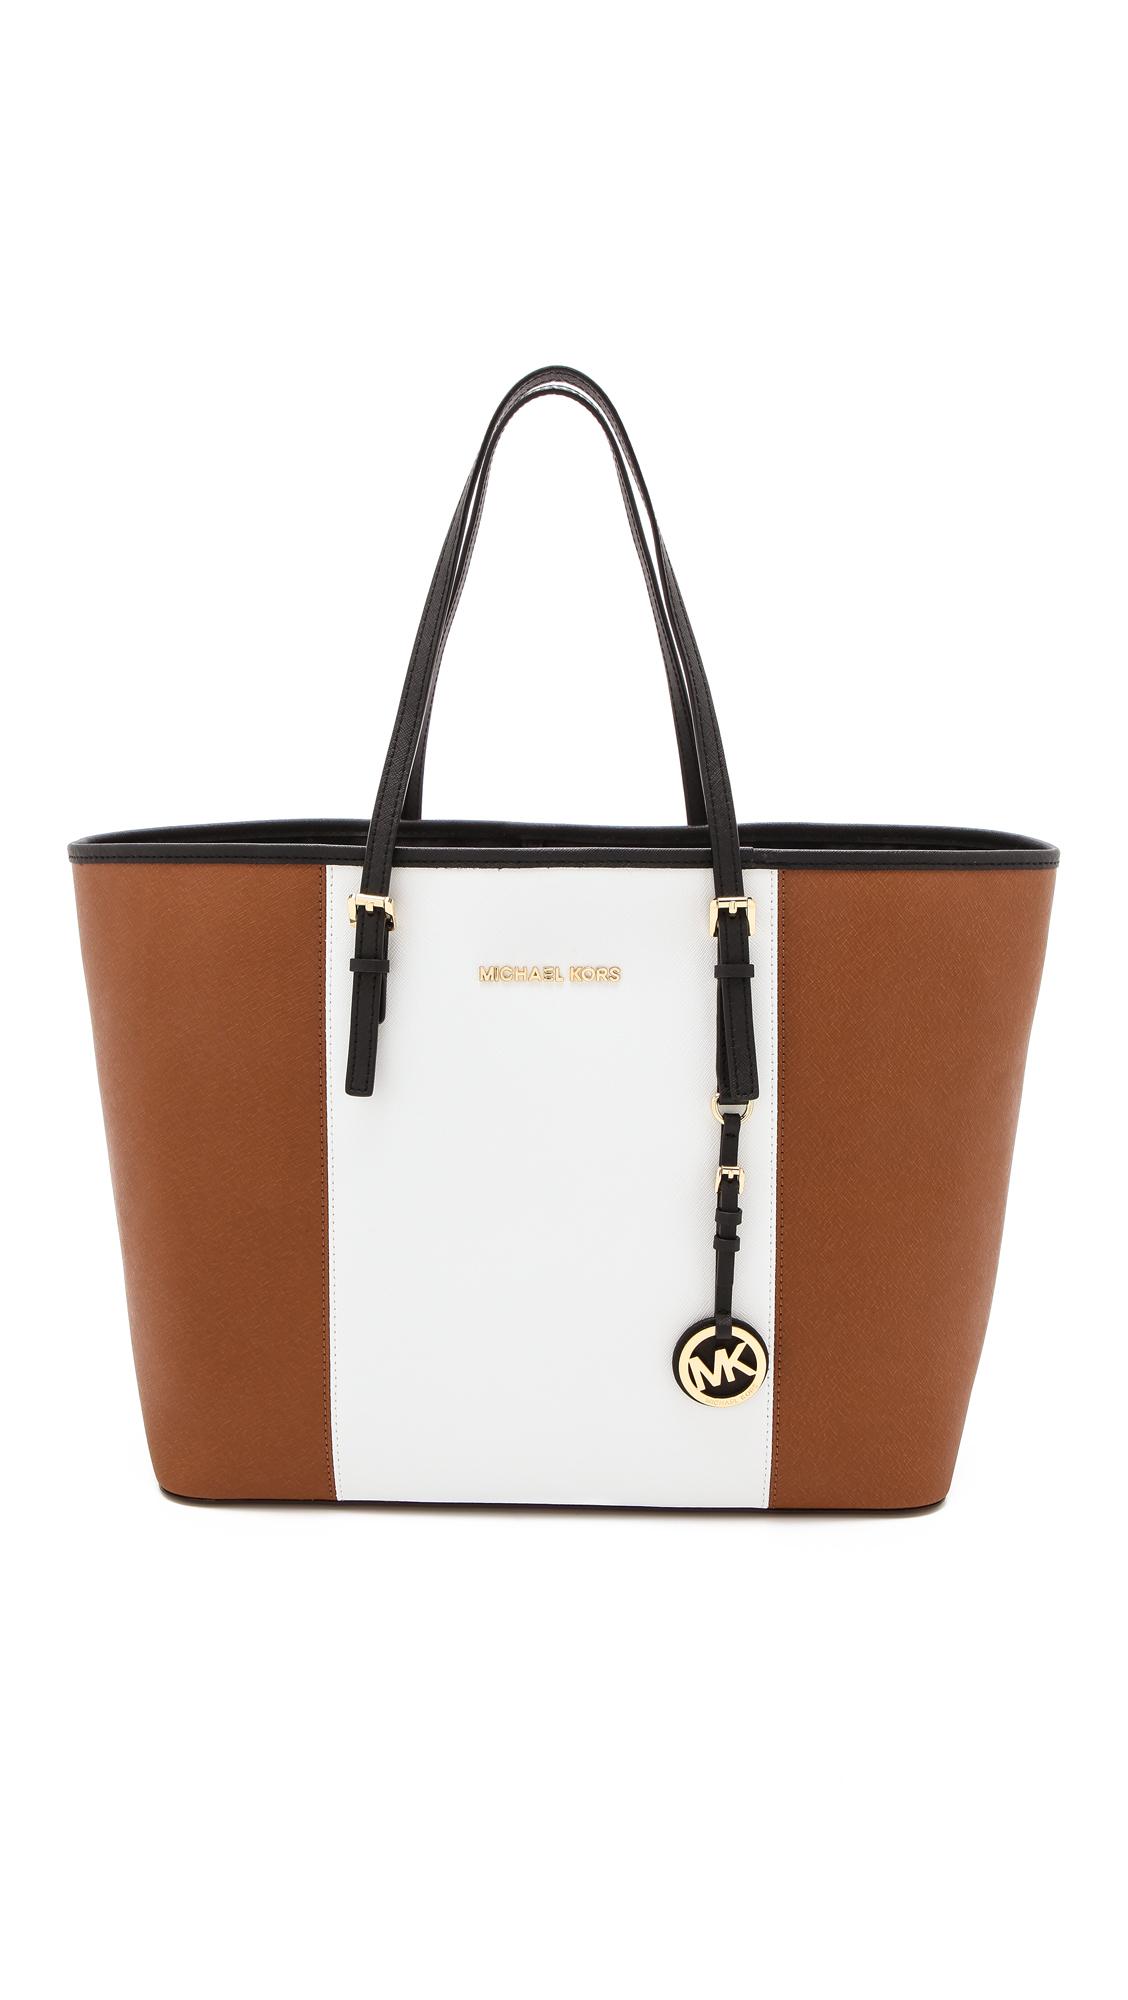 michael michael kors jet set travel travel tote luggage white black in brown luggage white. Black Bedroom Furniture Sets. Home Design Ideas